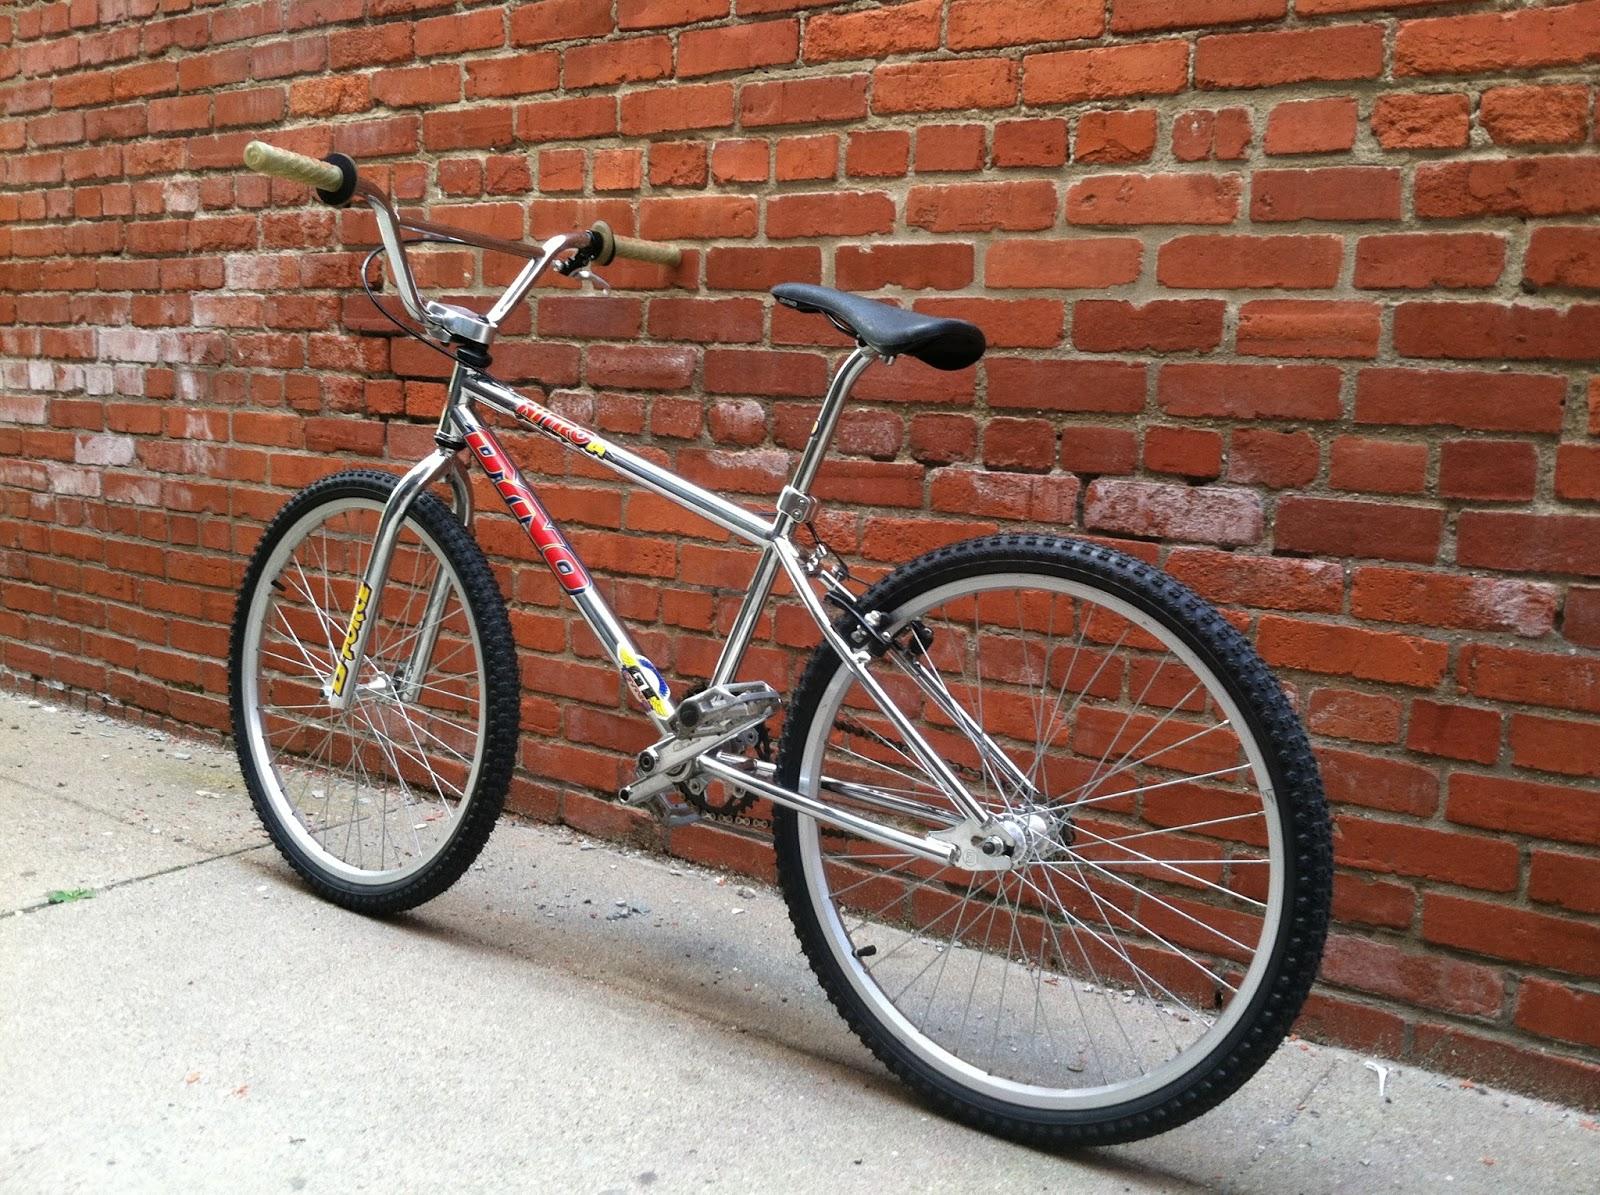 1996 Dyno Nitro 24 Inch Cruiser (Chrome) | Whistle | Bike | Collective